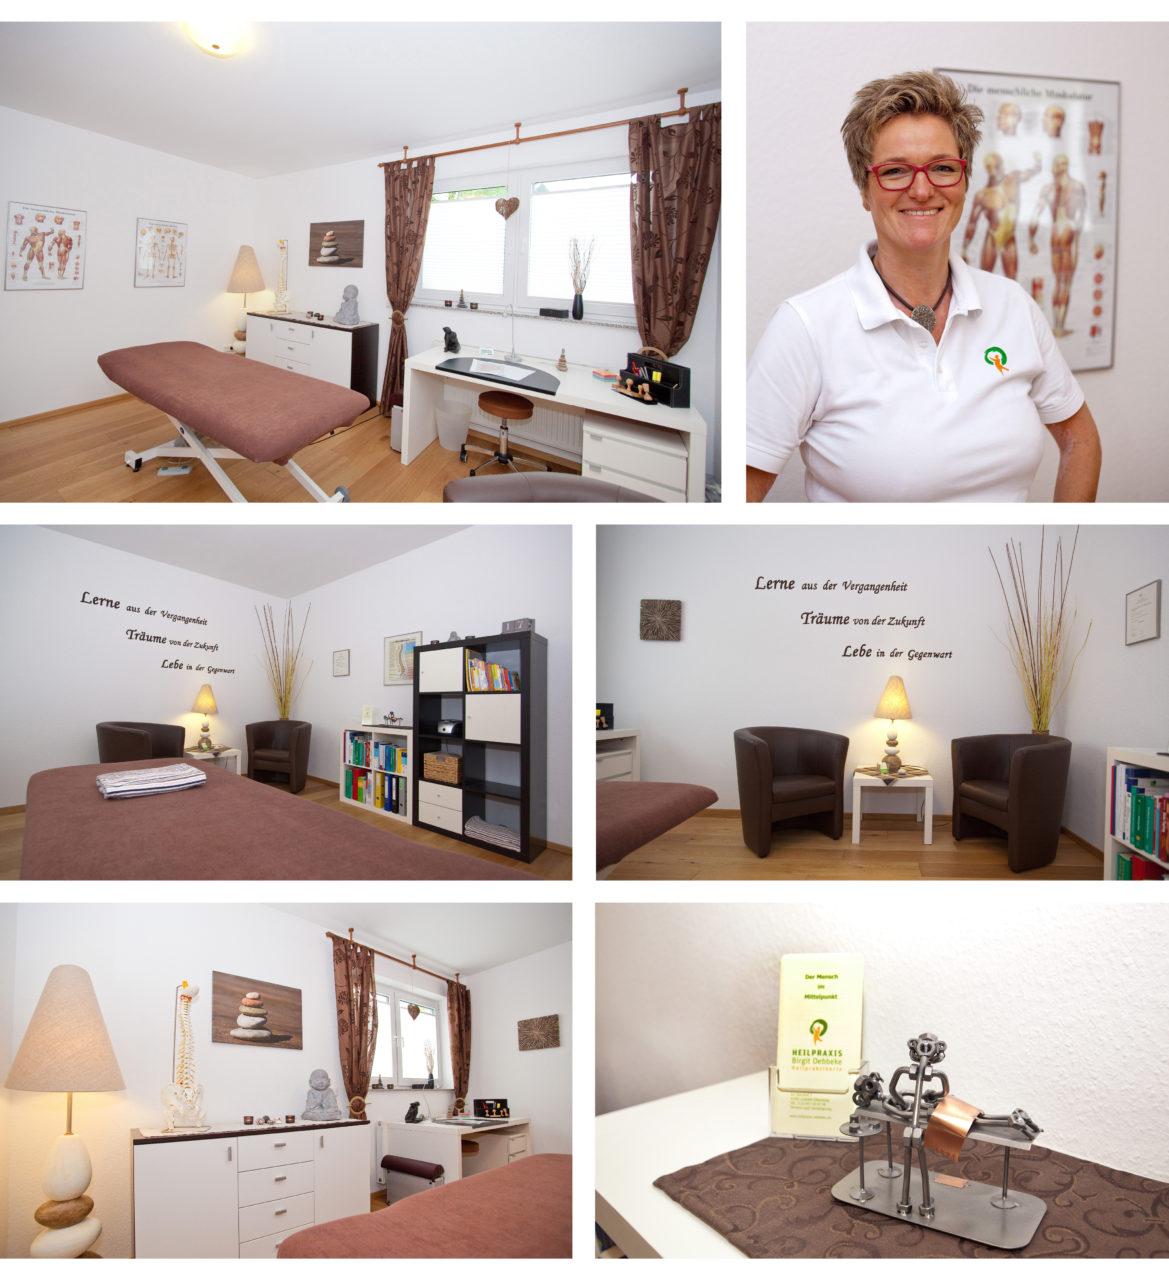 Birgit Oebbeke Referenz 03 Fotografie Bilder Galerie